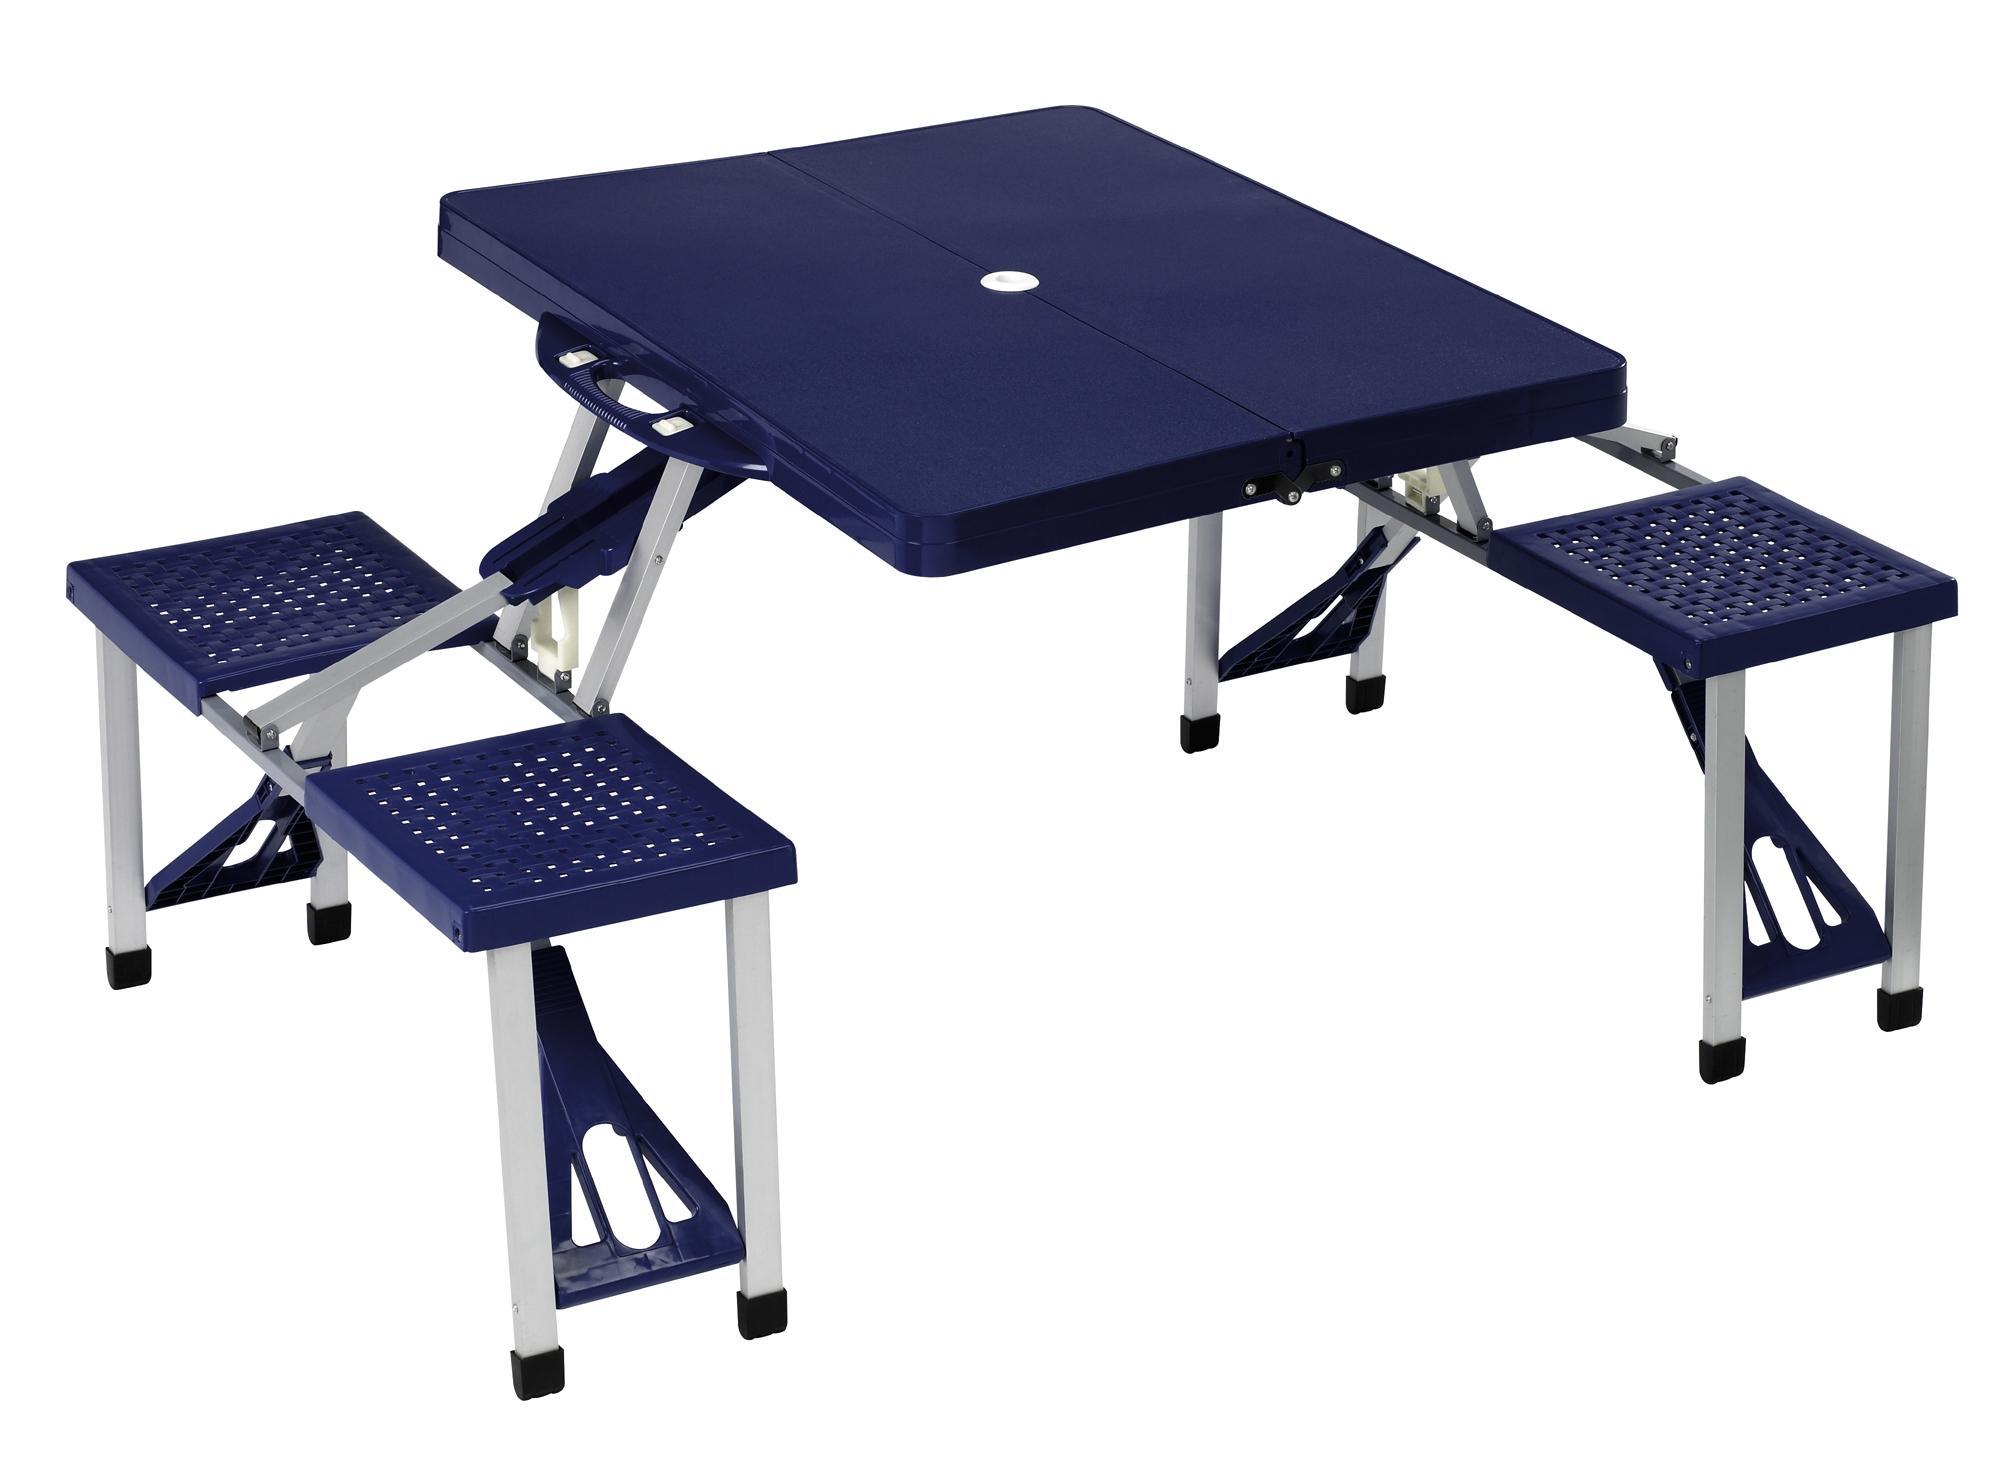 halfords folding picnic table blue aluminium 4 plastic seats outdoor camping ebay. Black Bedroom Furniture Sets. Home Design Ideas